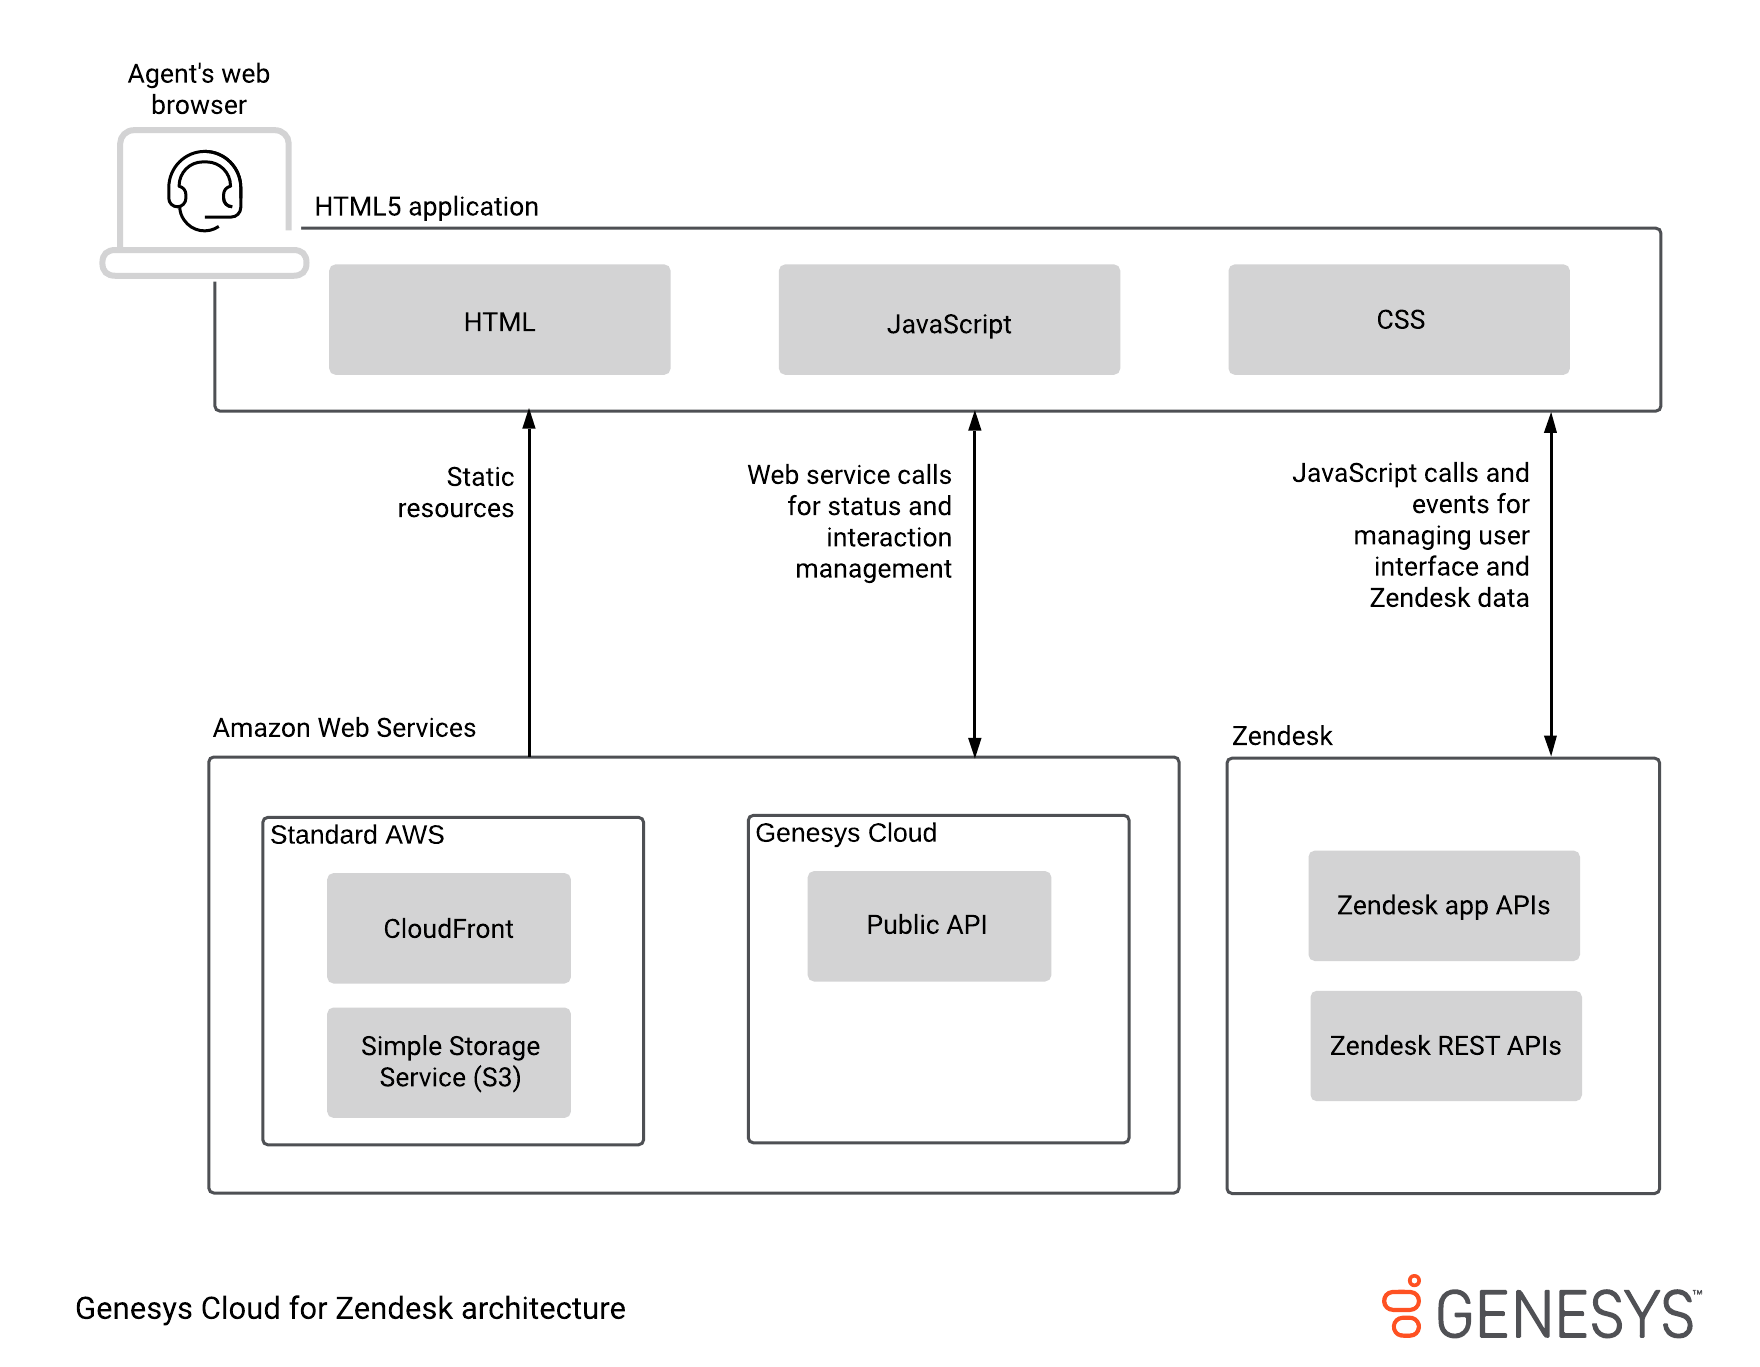 Zendesk 用 Genesys Cloud のアーキテクチャ図